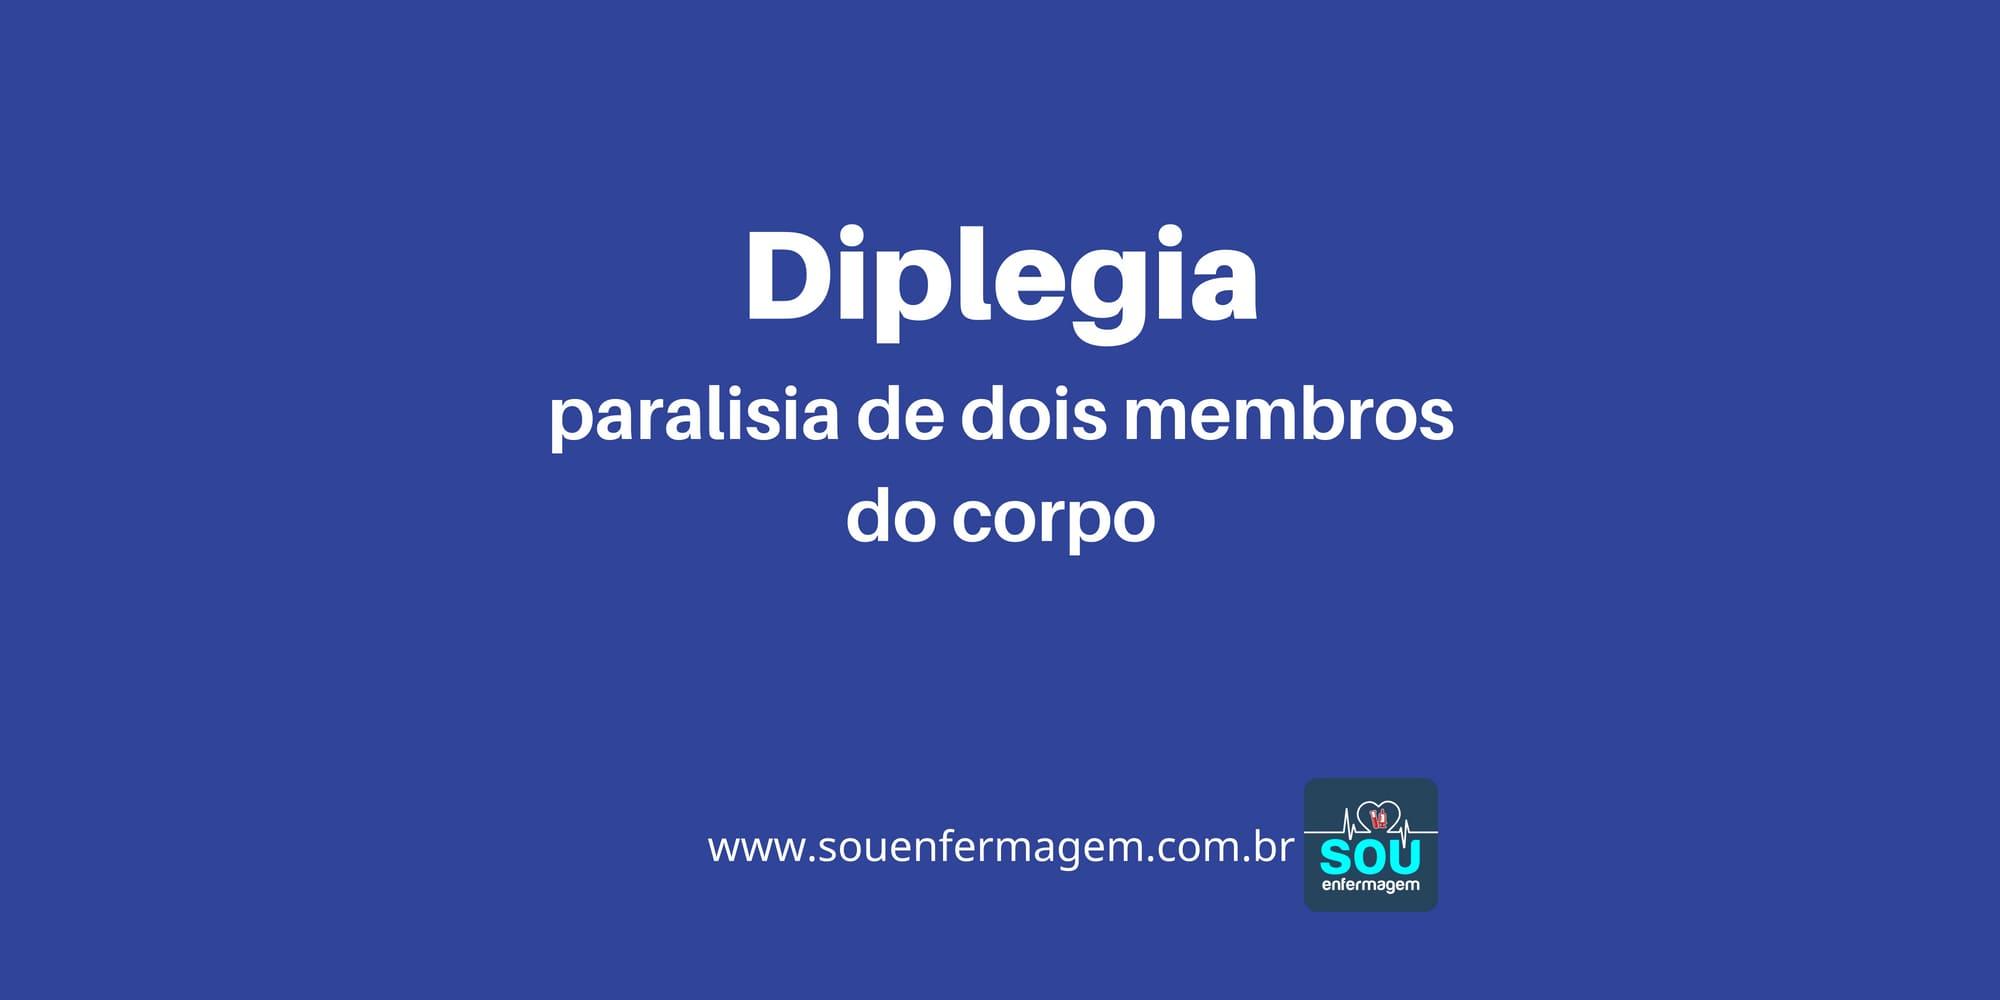 Diplegia